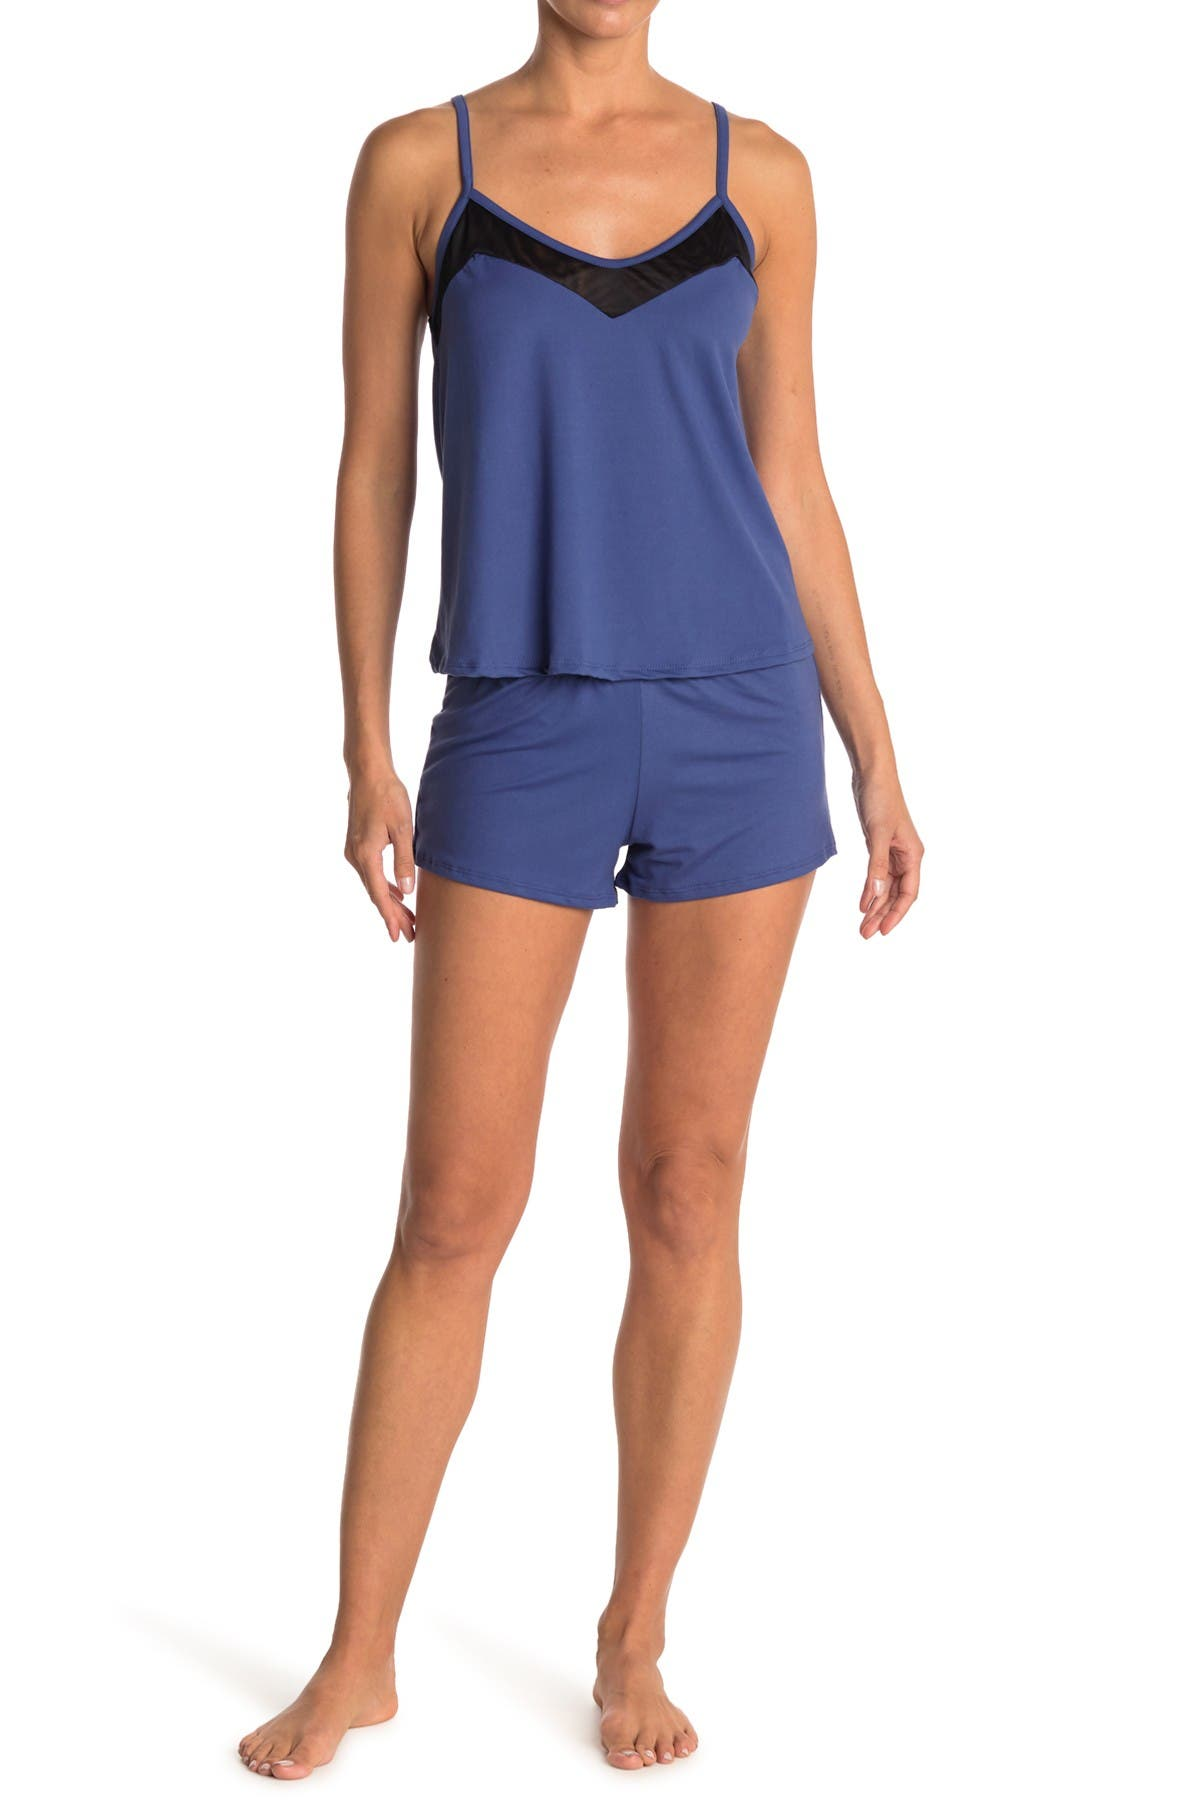 Image of COZY ROZY Mesh Camisole & Short 2-Piece Pajama Set